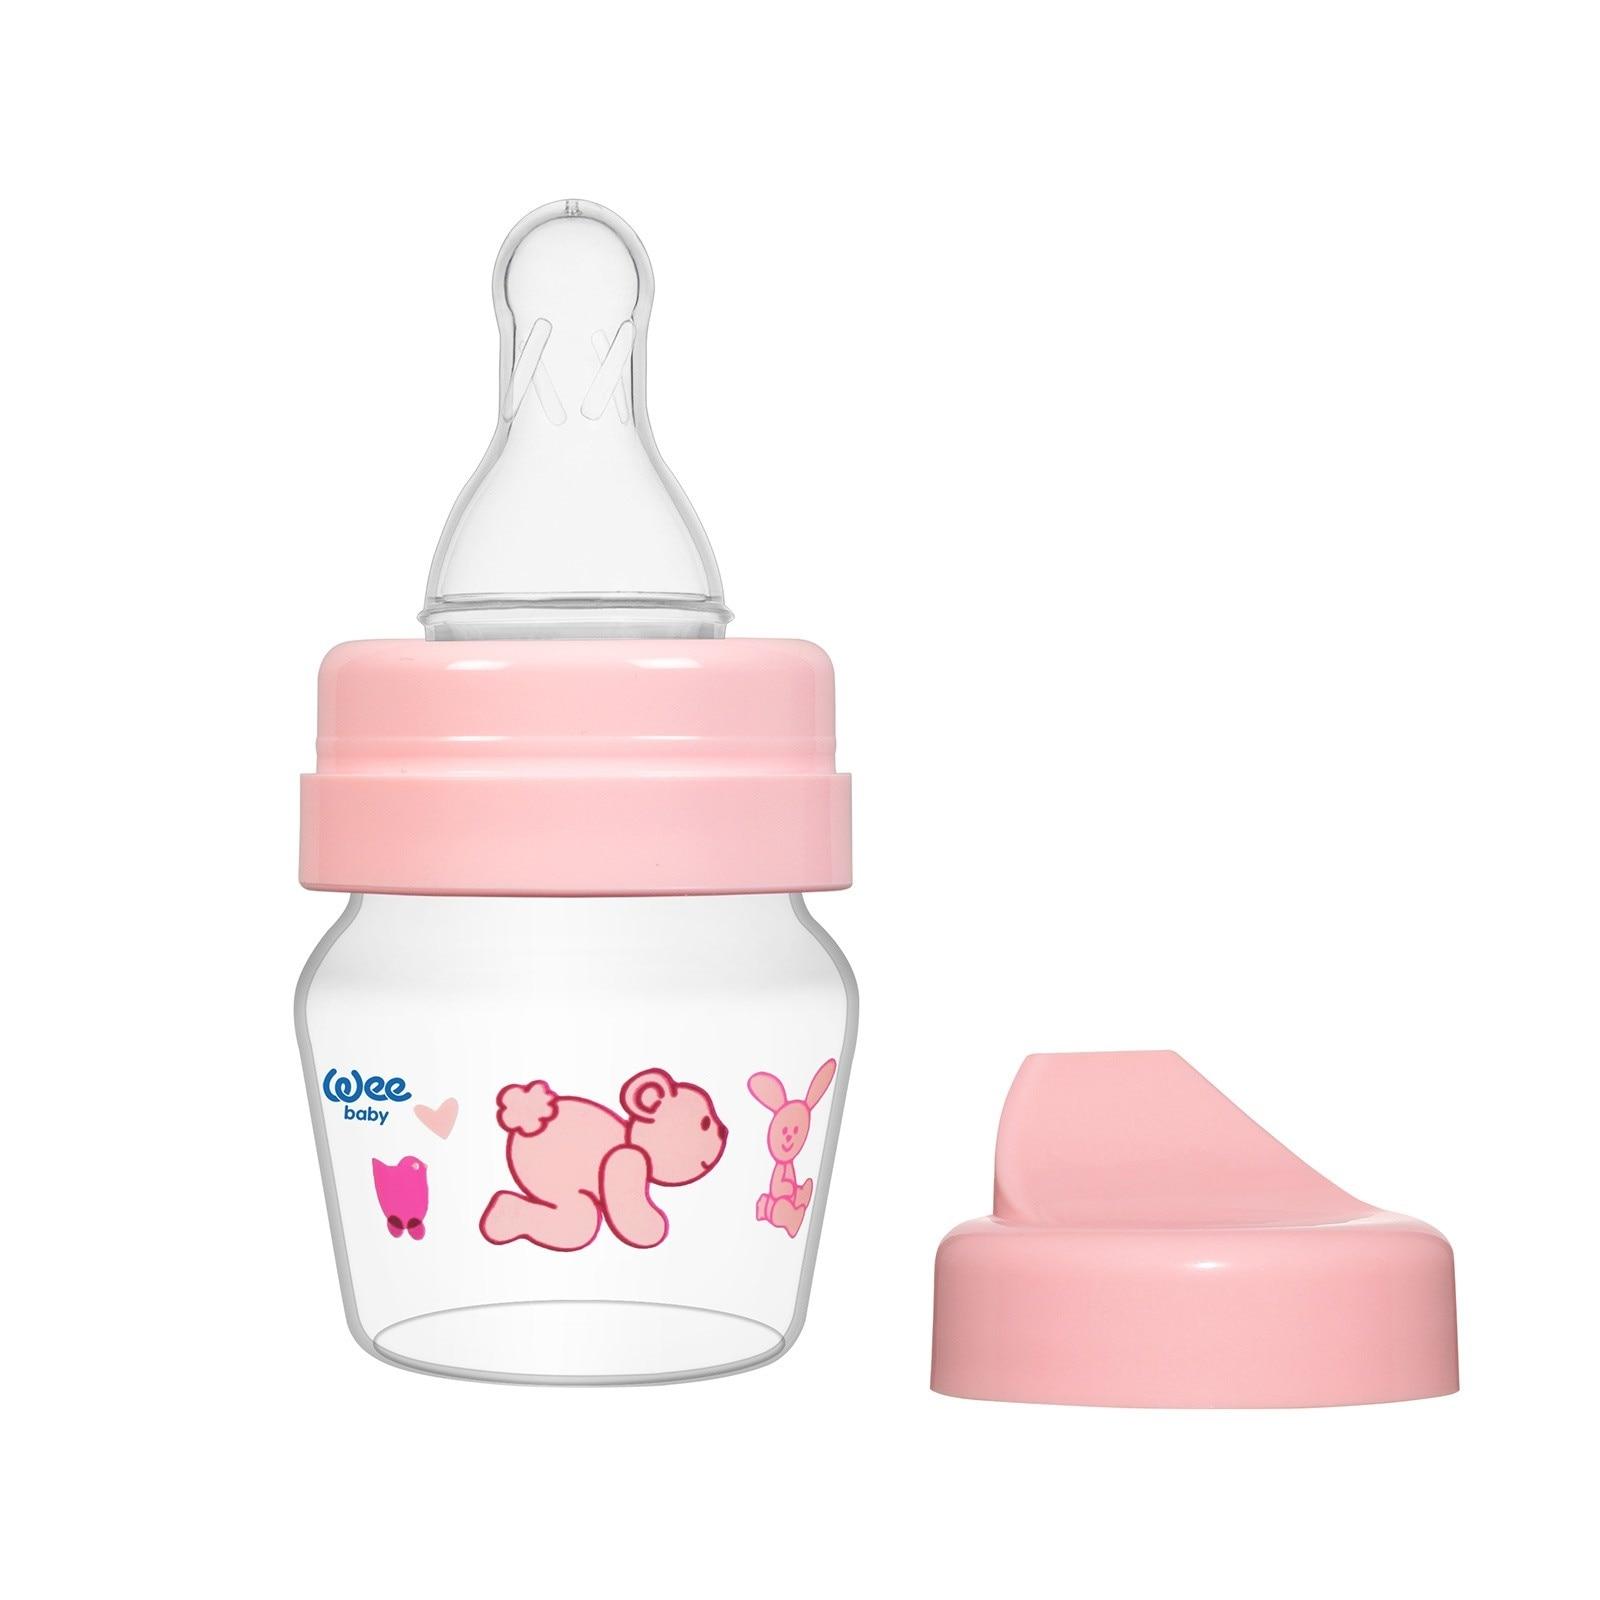 Ebebek Wee Baby 778 Mini PP Training Cup Set 30 Ml 0-6 Month